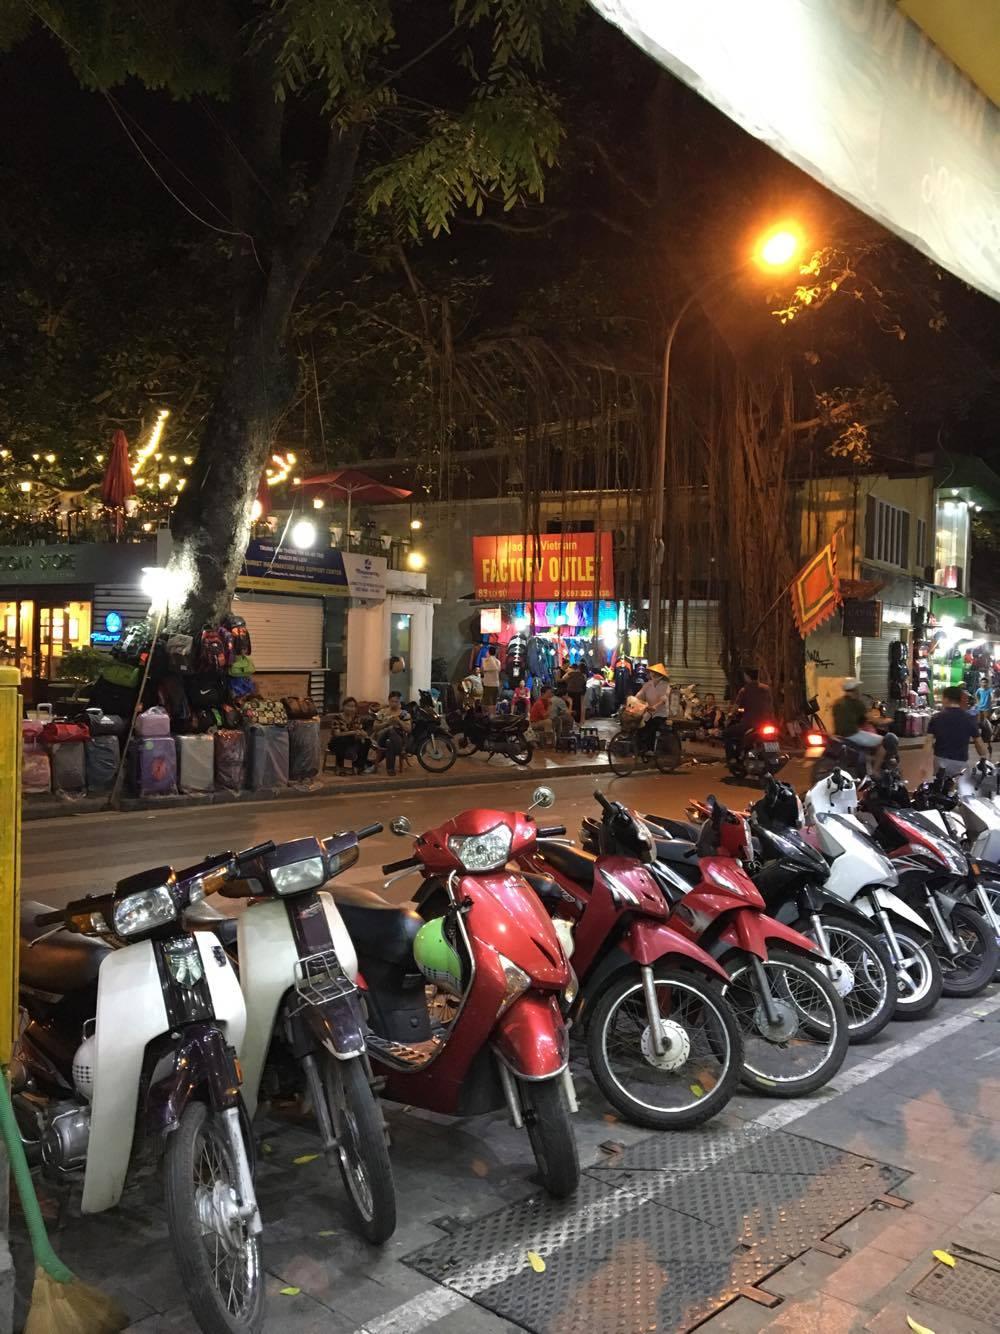 Yup, motorcycles everywhere!